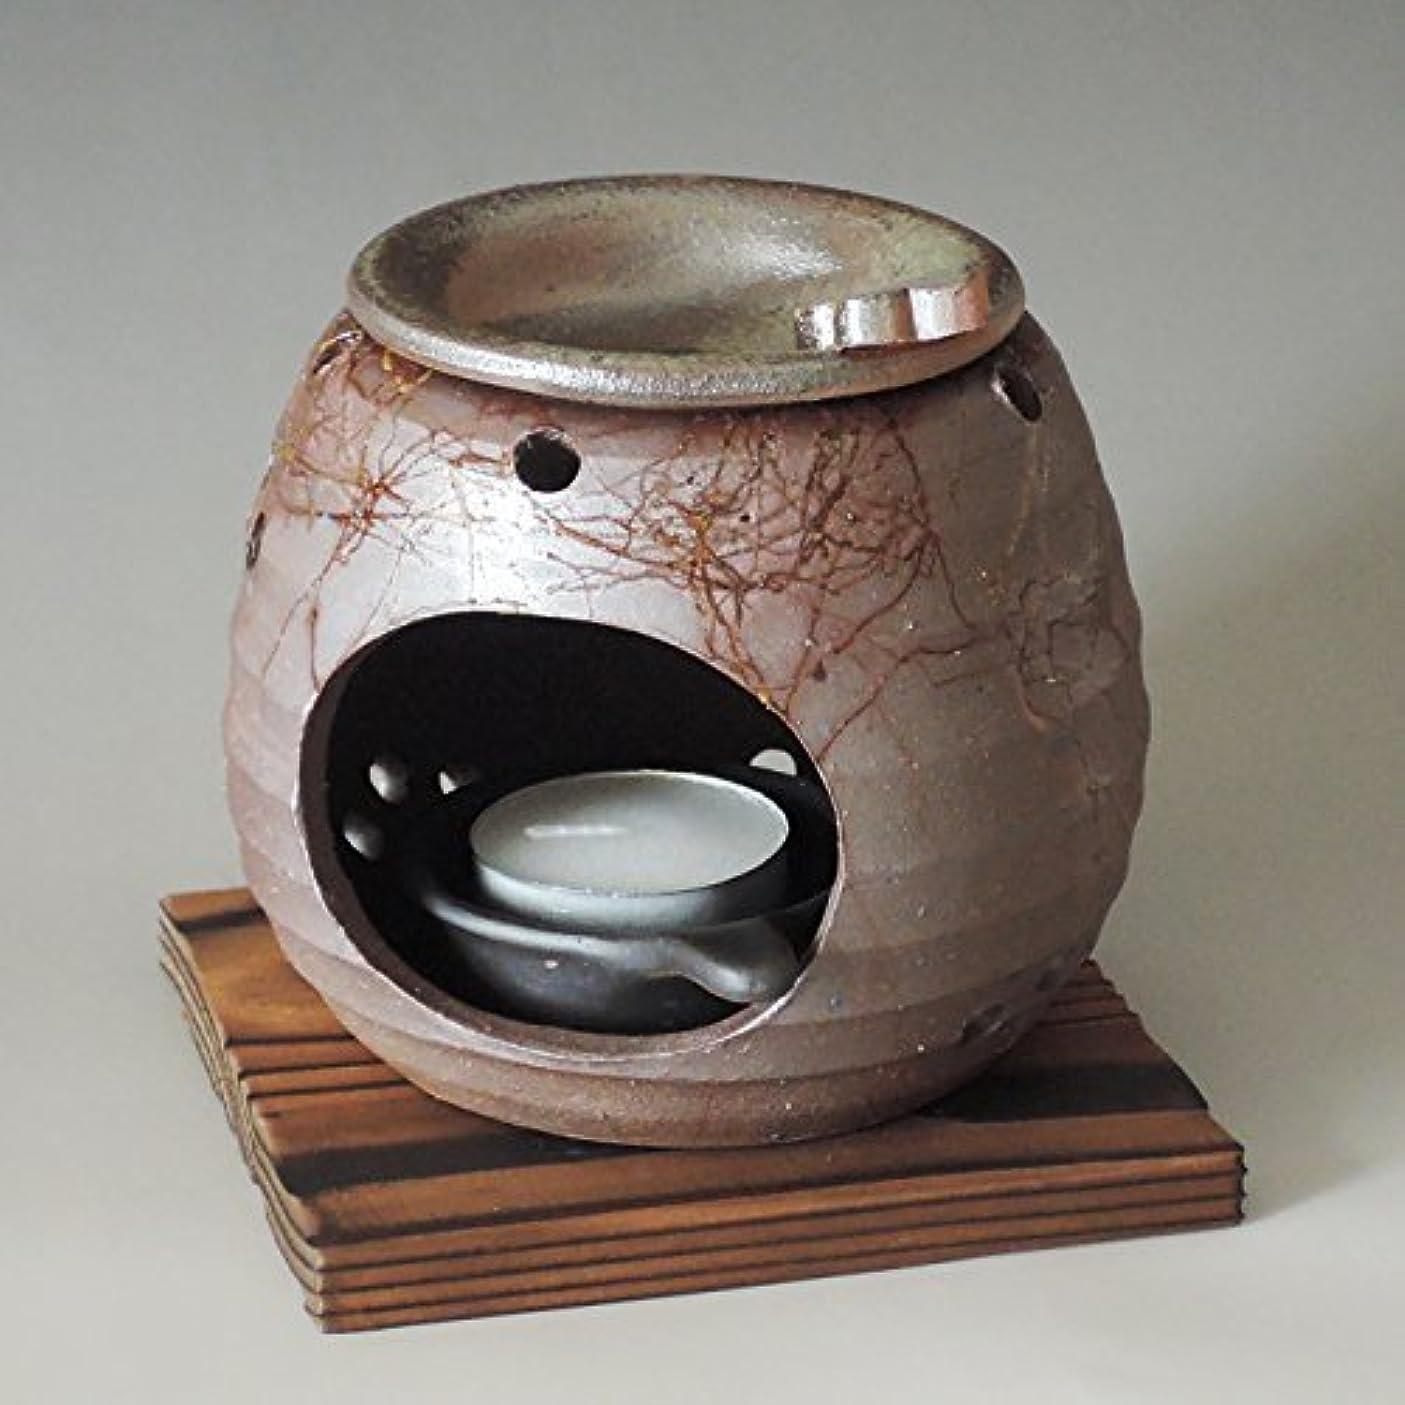 穀物広く余韻茶香炉 常滑焼 石龍作「藻掛け」川本屋茶舗